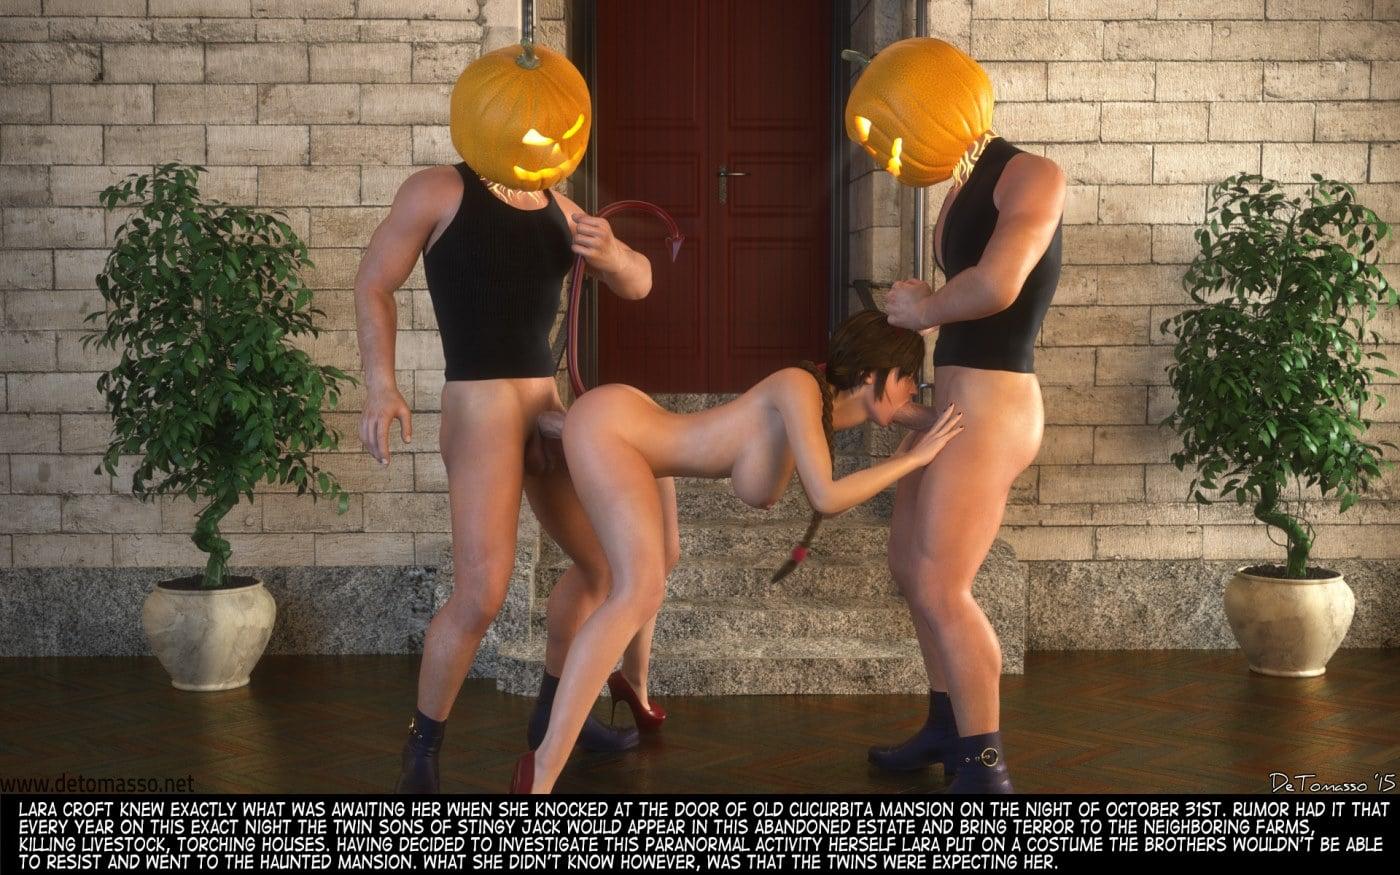 Porn Comics - Lara Croft And Sons Of Sting Jack- DeTomasso porn comics 8 muses